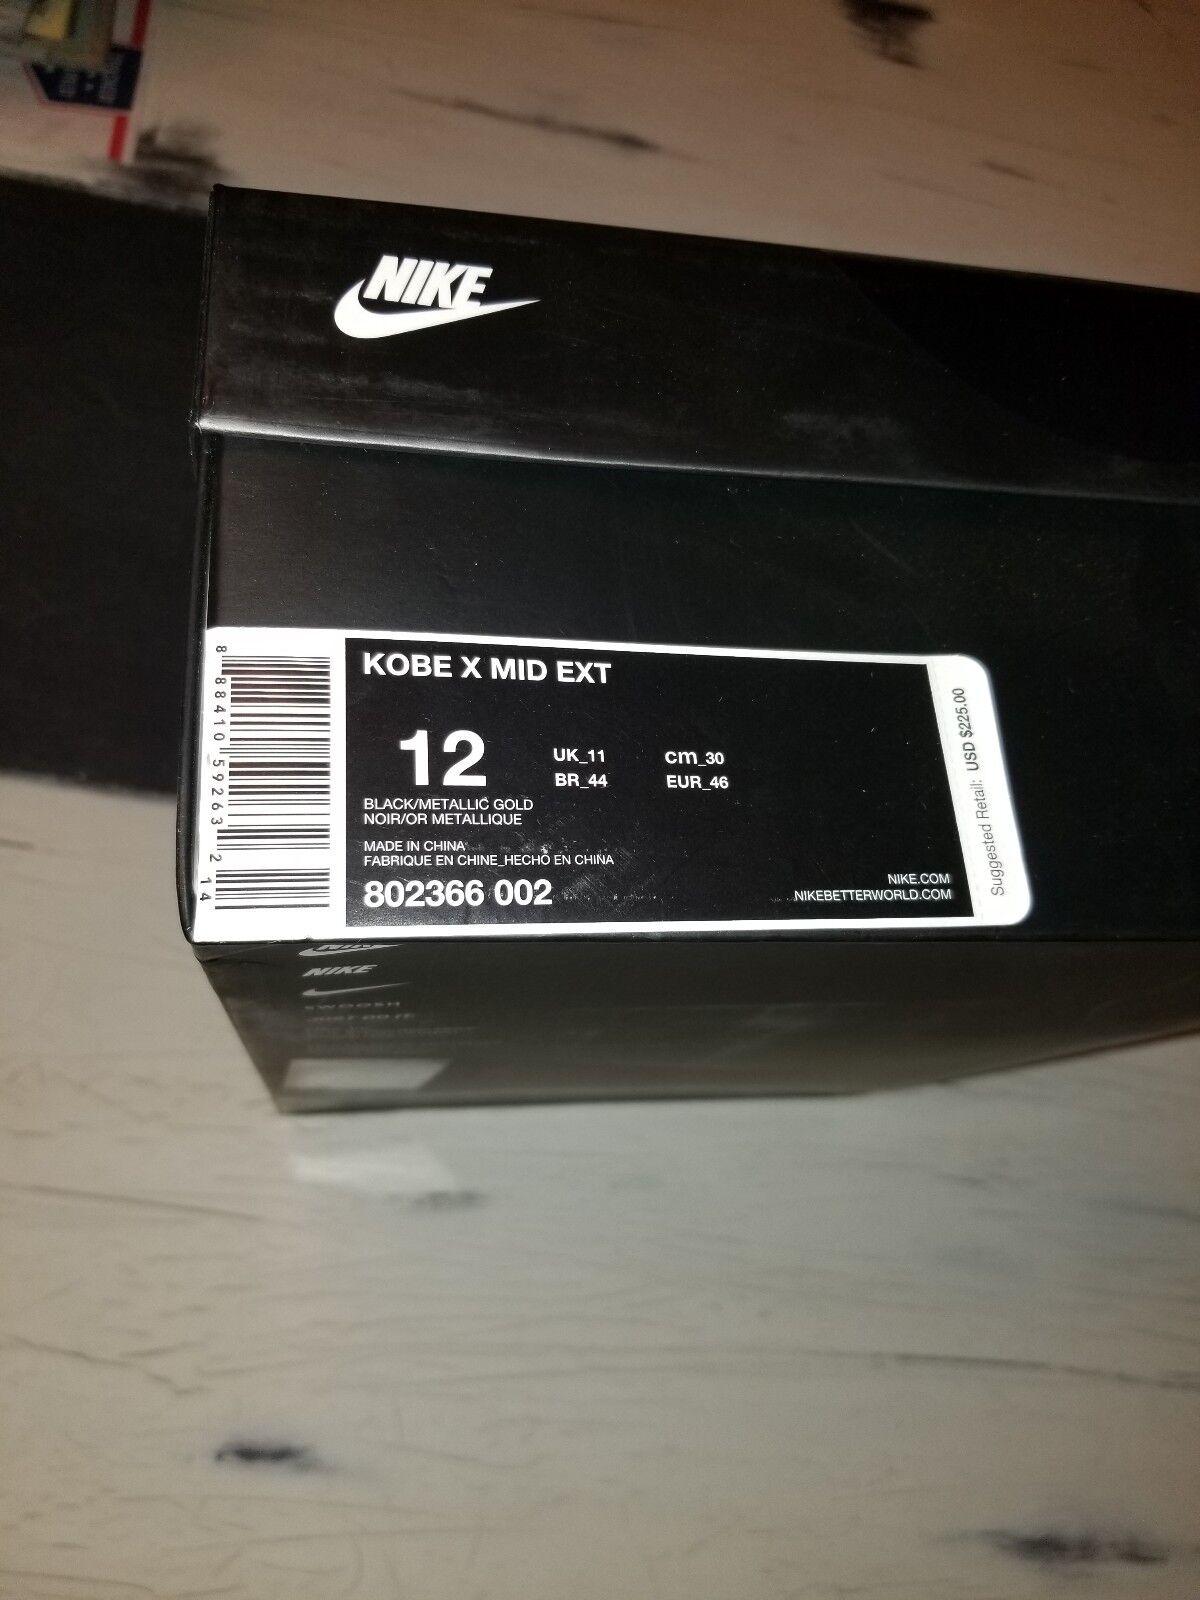 Nike Kobe X Mid EXT Black Metallic gold Size 12